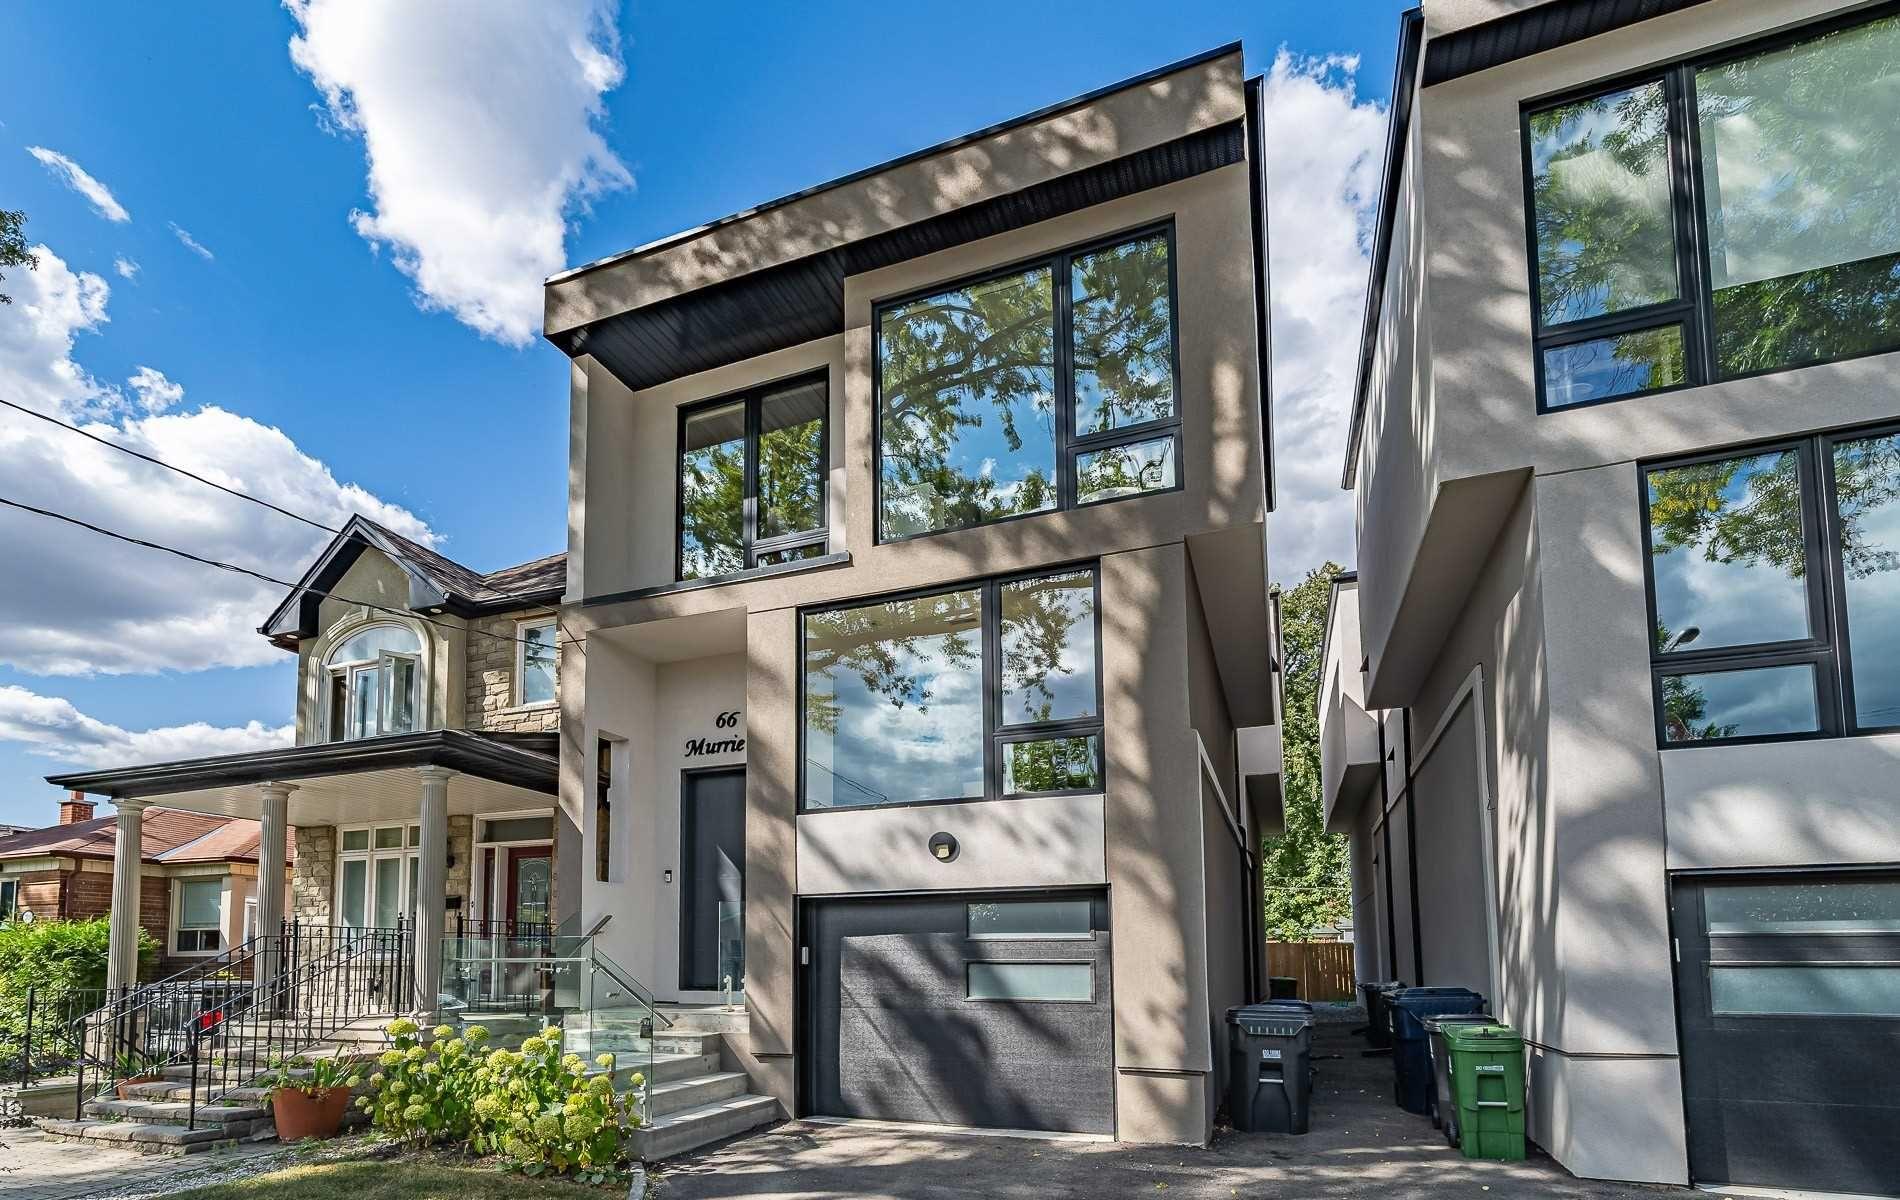 Main Photo: 66 Murrie Street in Toronto: Mimico House (2-Storey) for sale (Toronto W06)  : MLS®# W4933635